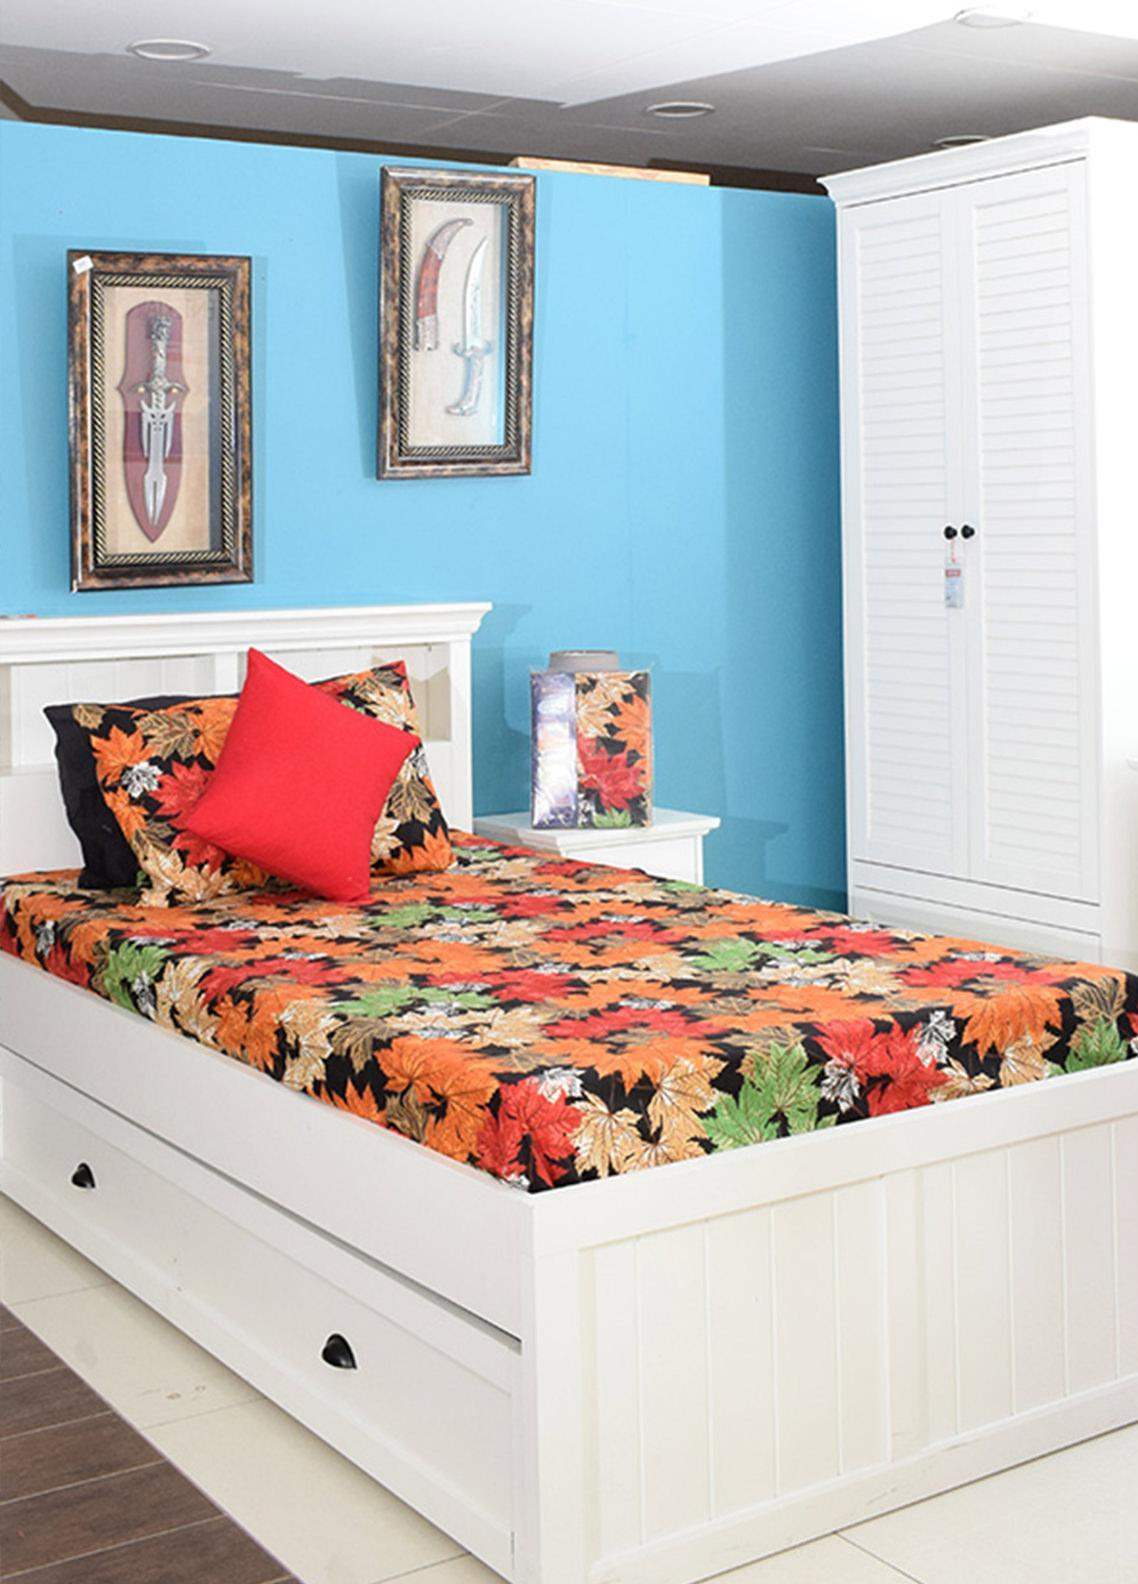 Plush Mink Single Bed Man Made Material Fantasy Bed Sheet Supreme Finish FS05 - Home & Decor